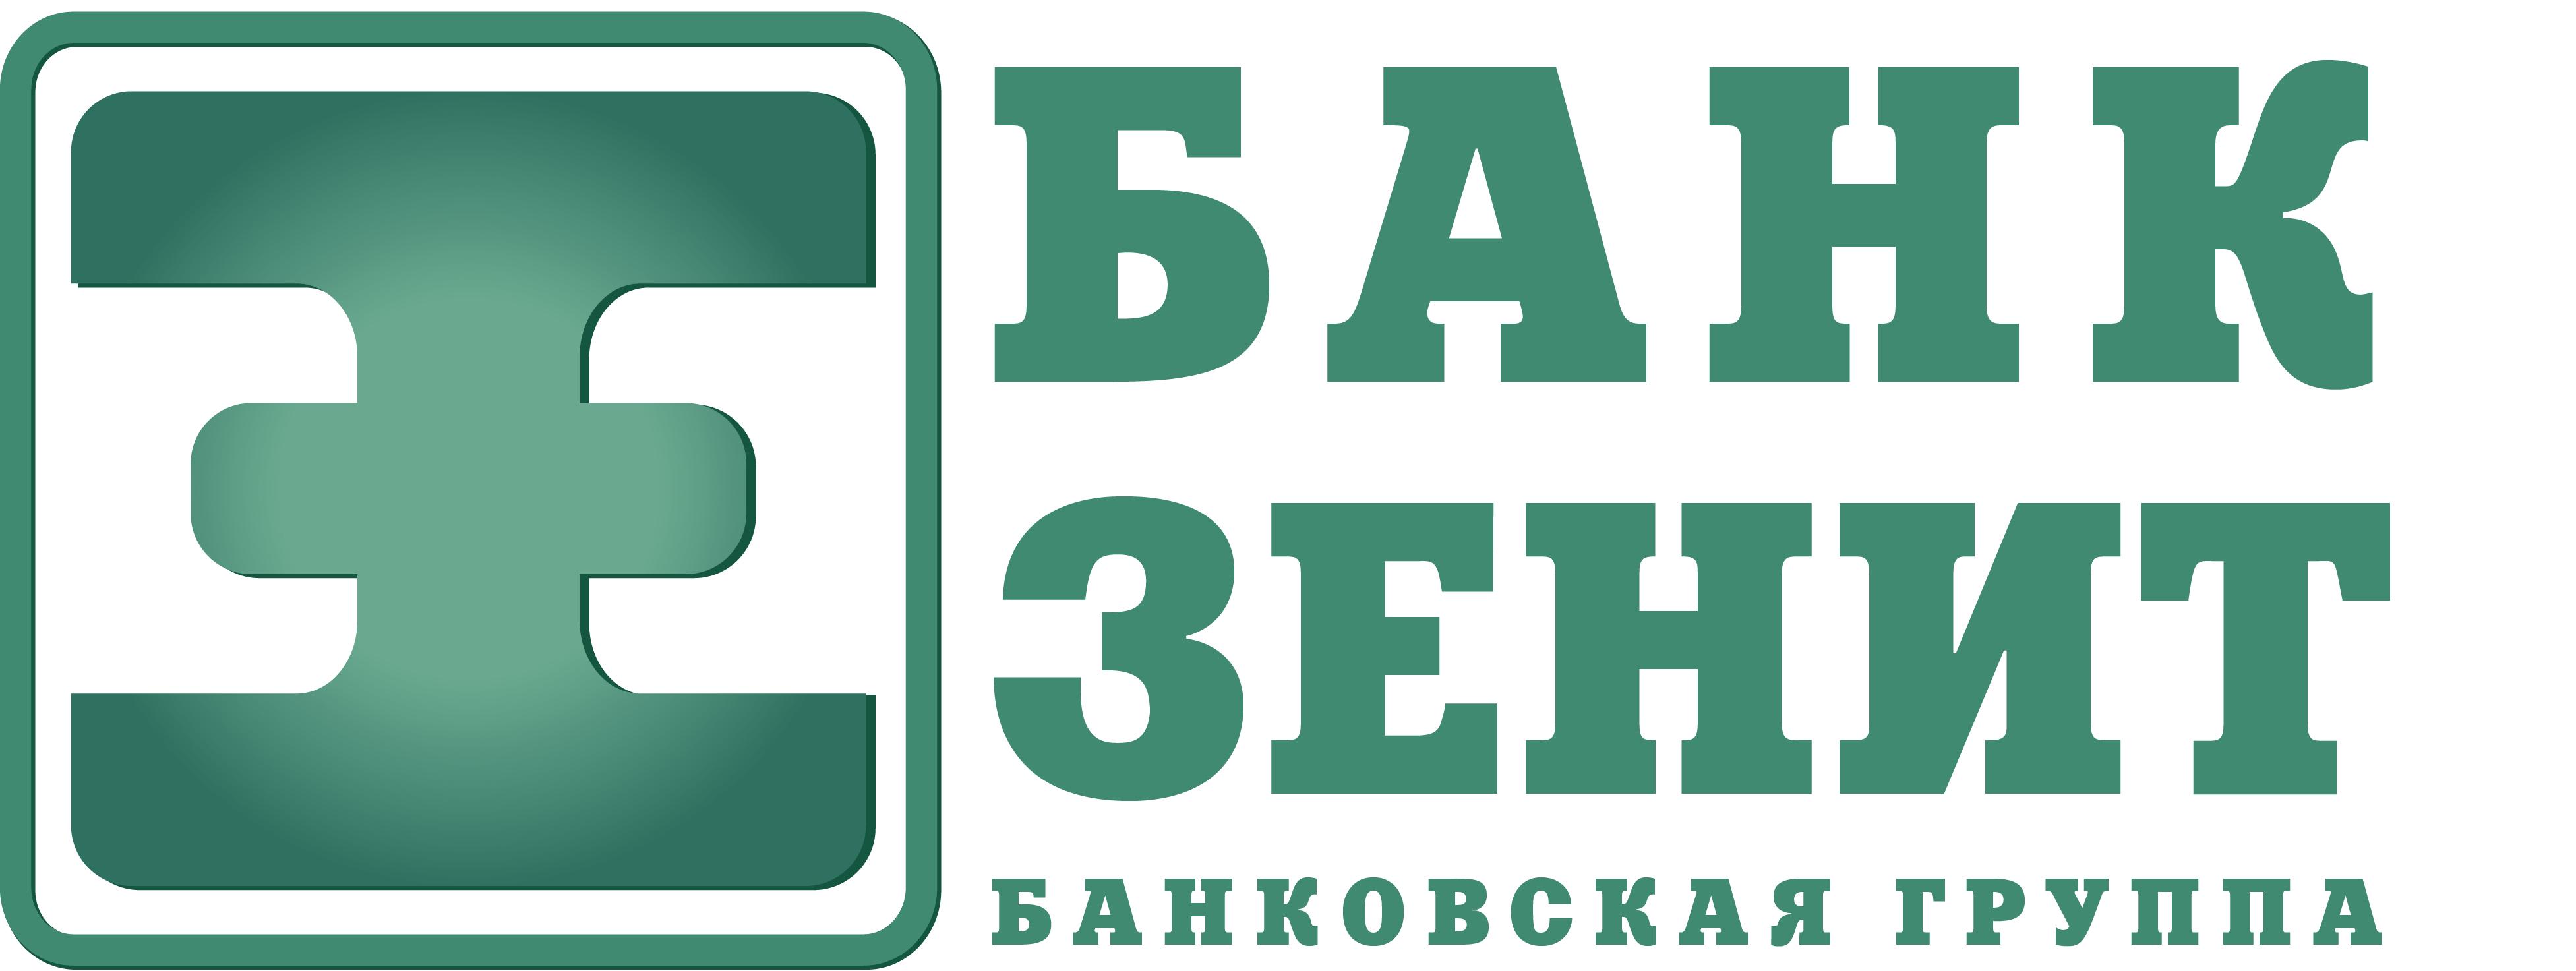 Разработка логотипа для Банка ЗЕНИТ фото f_4255b4c87164f3df.jpg